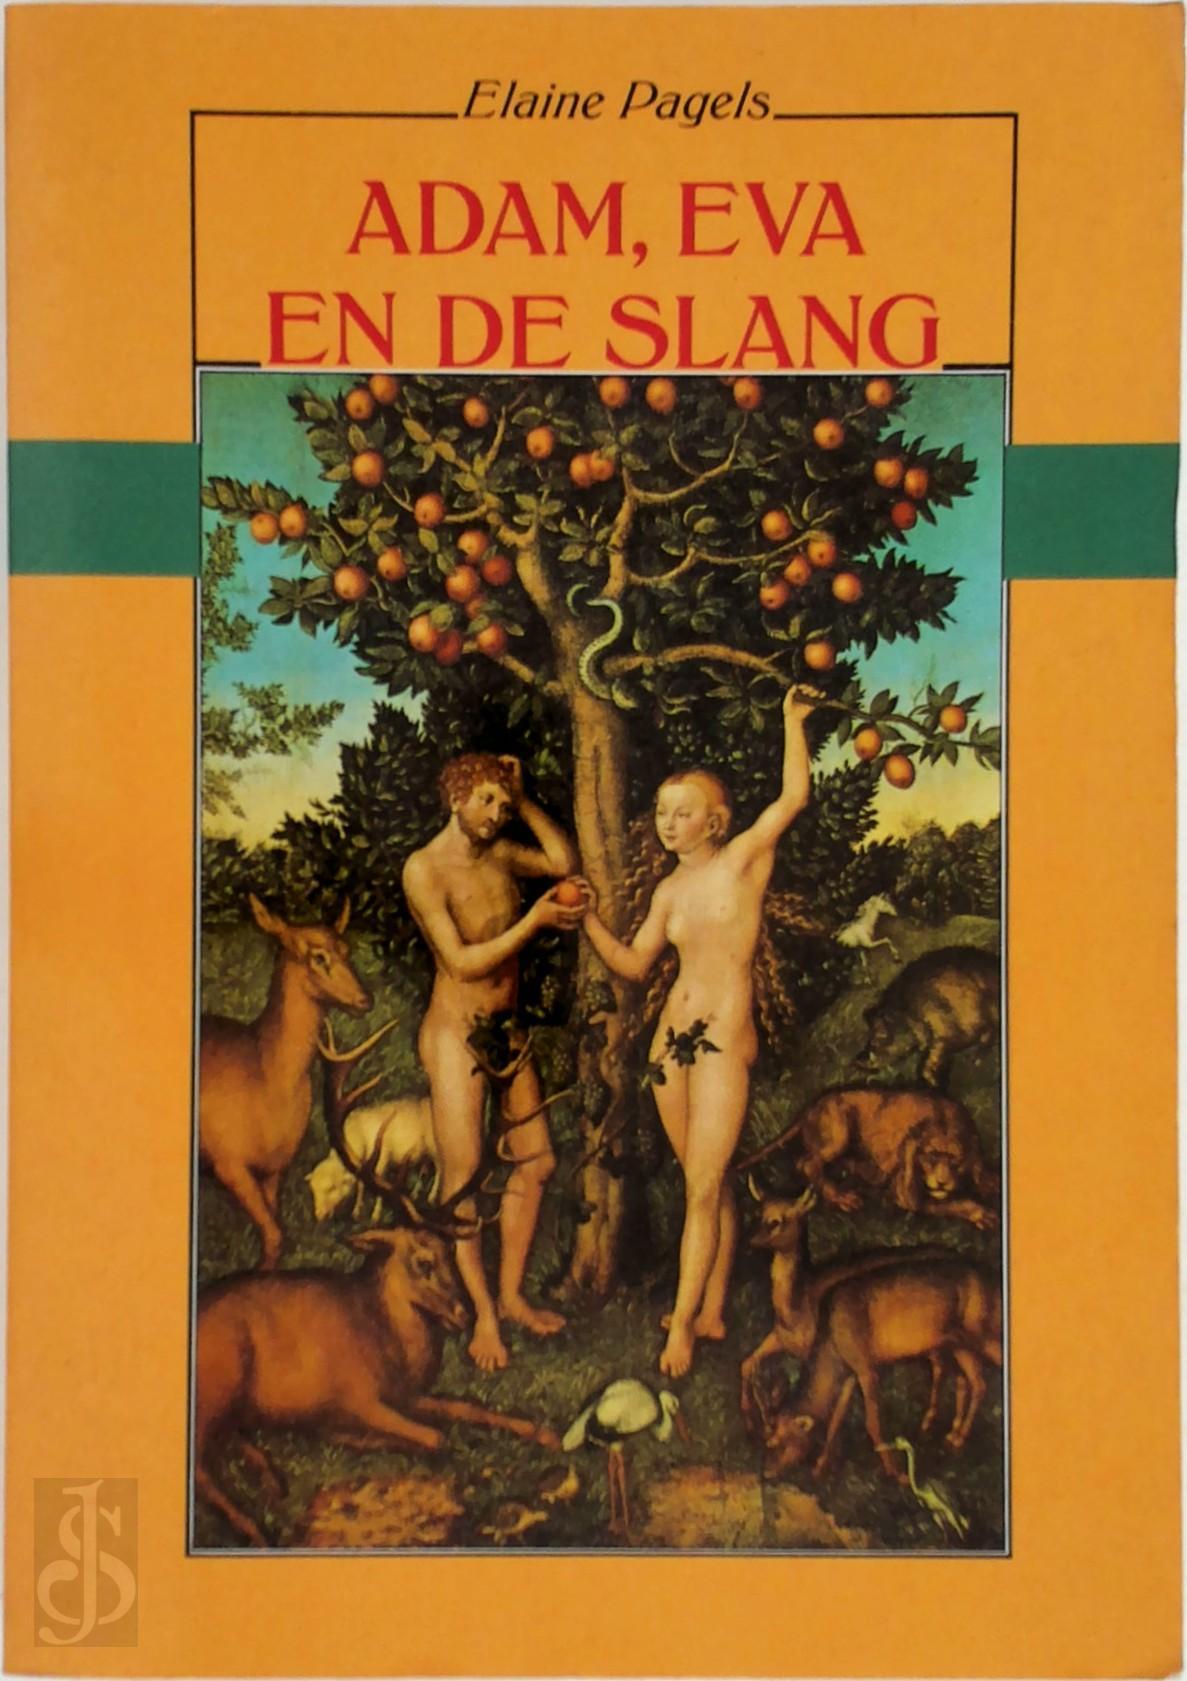 Adam, Eva en de slang